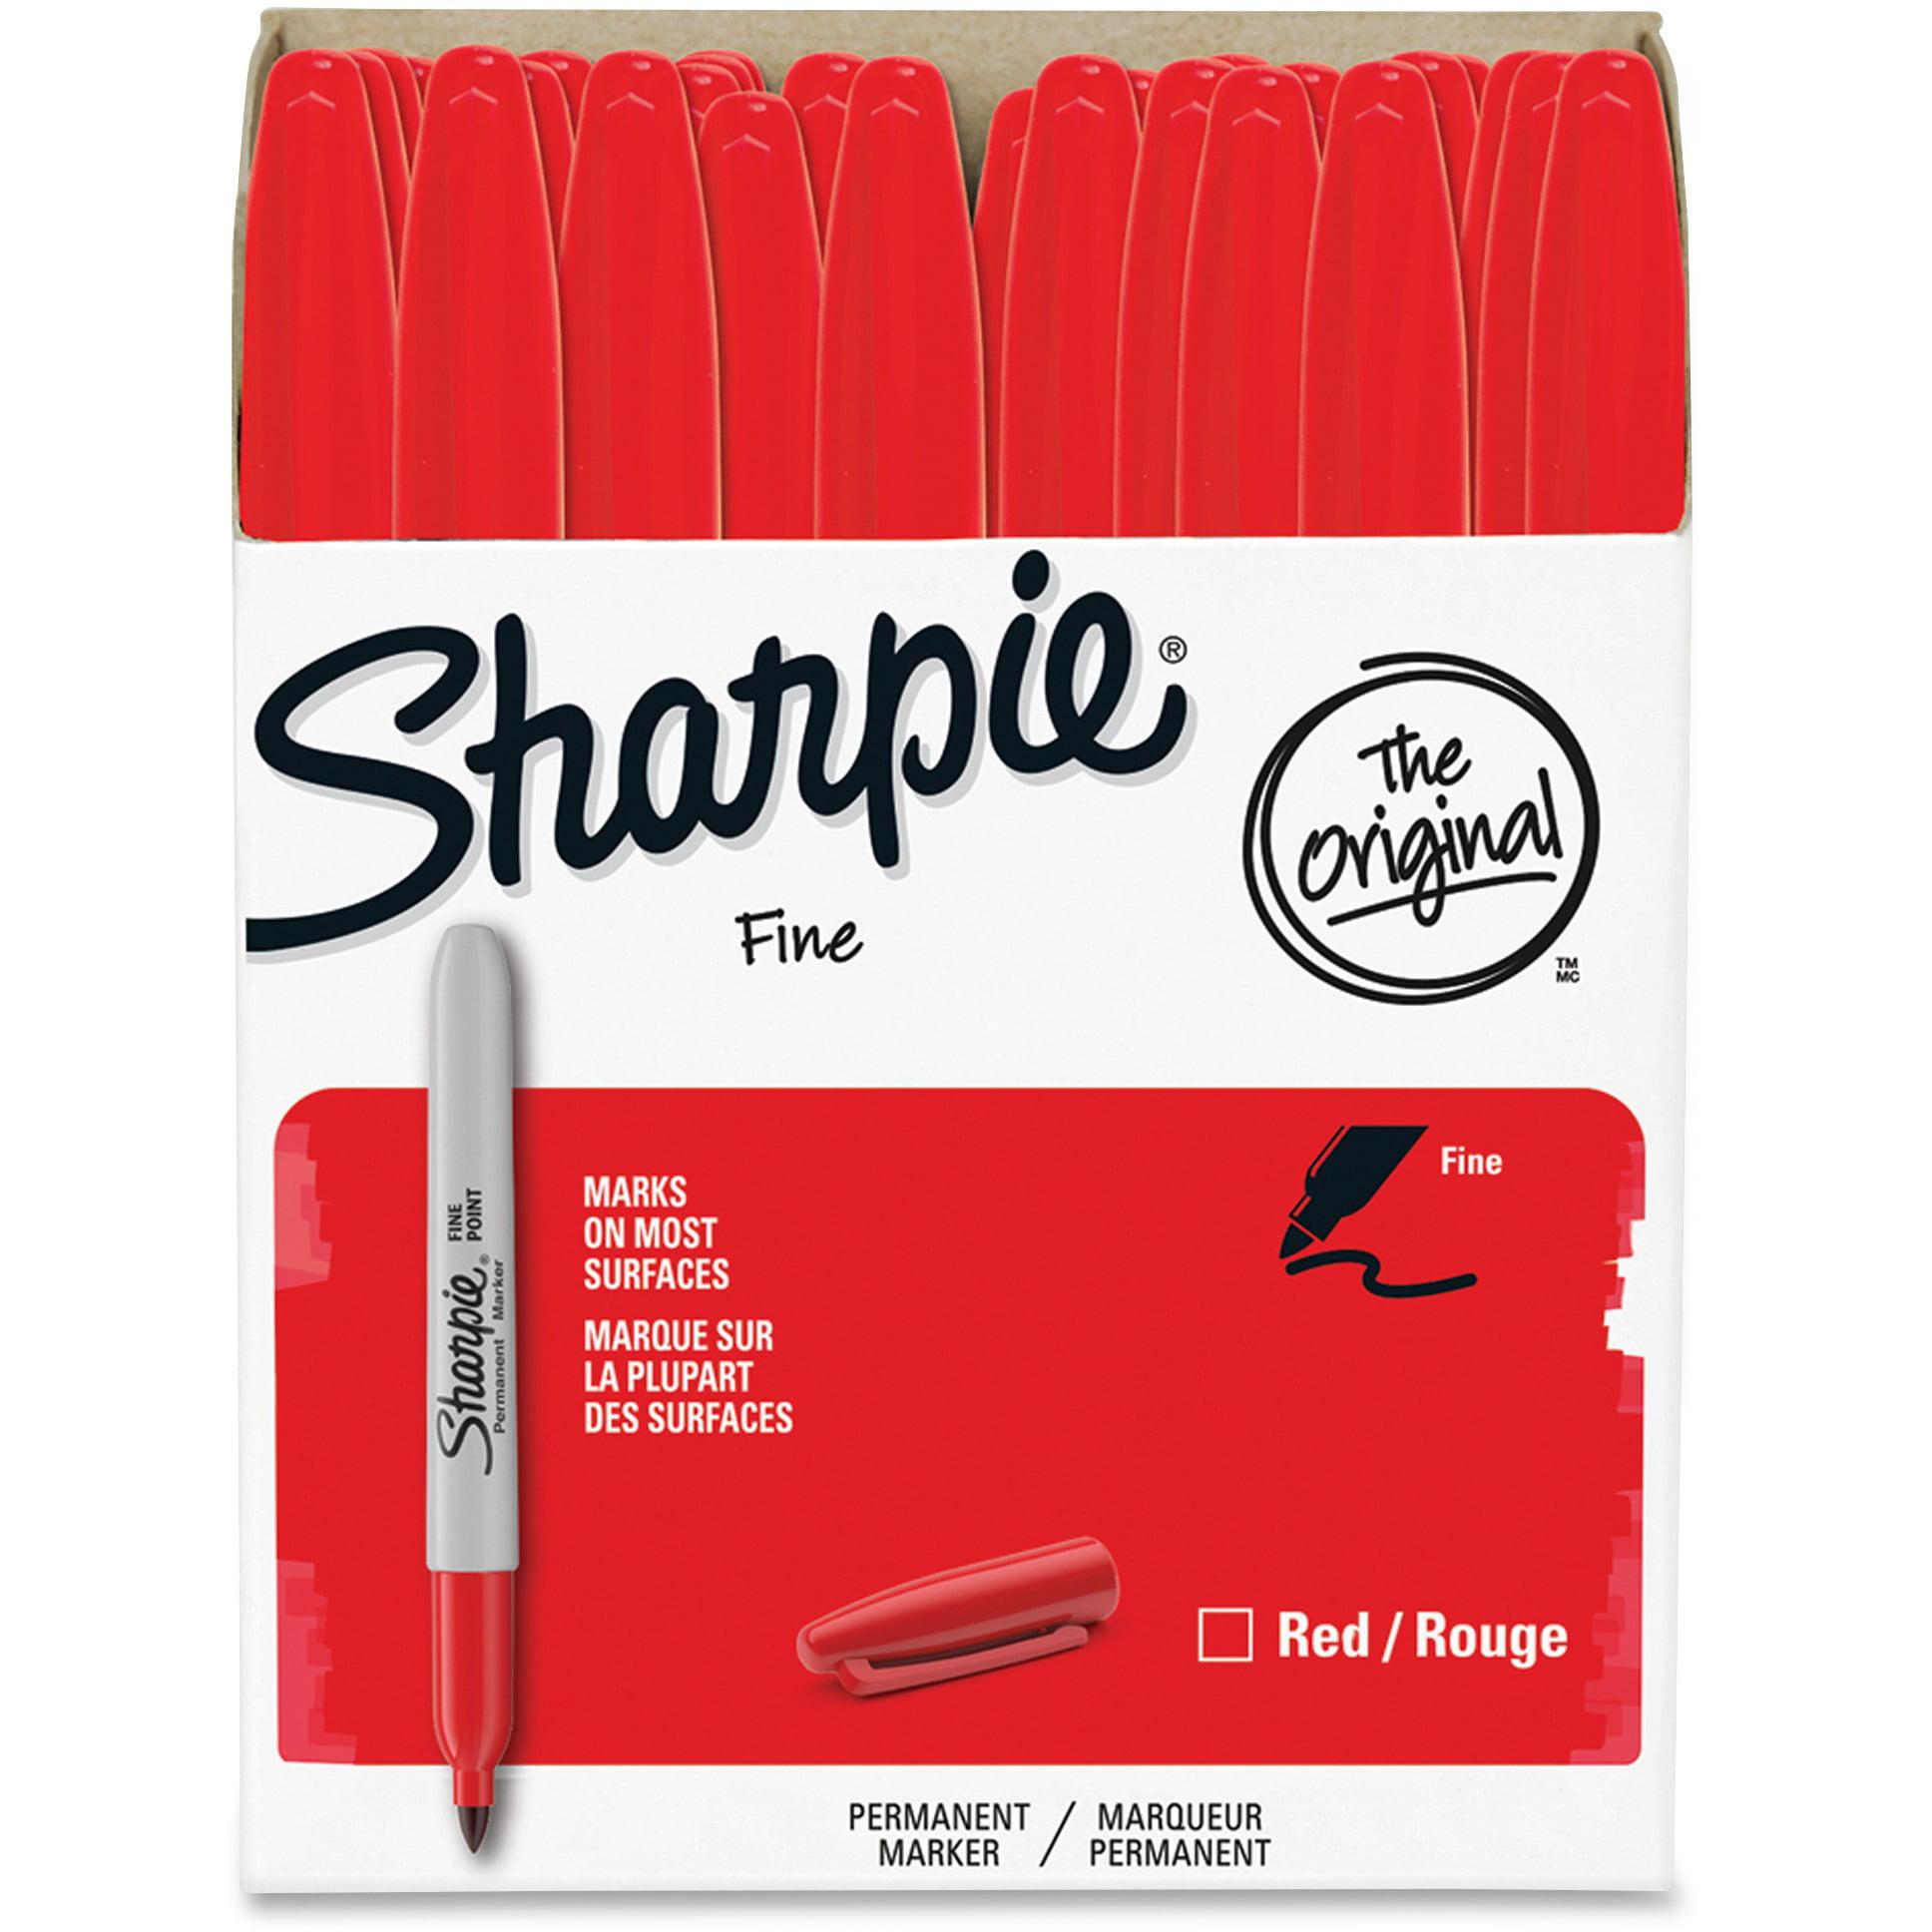 Sharpie Pen-style Permanent Marker, 36 / Pack (Quantity)